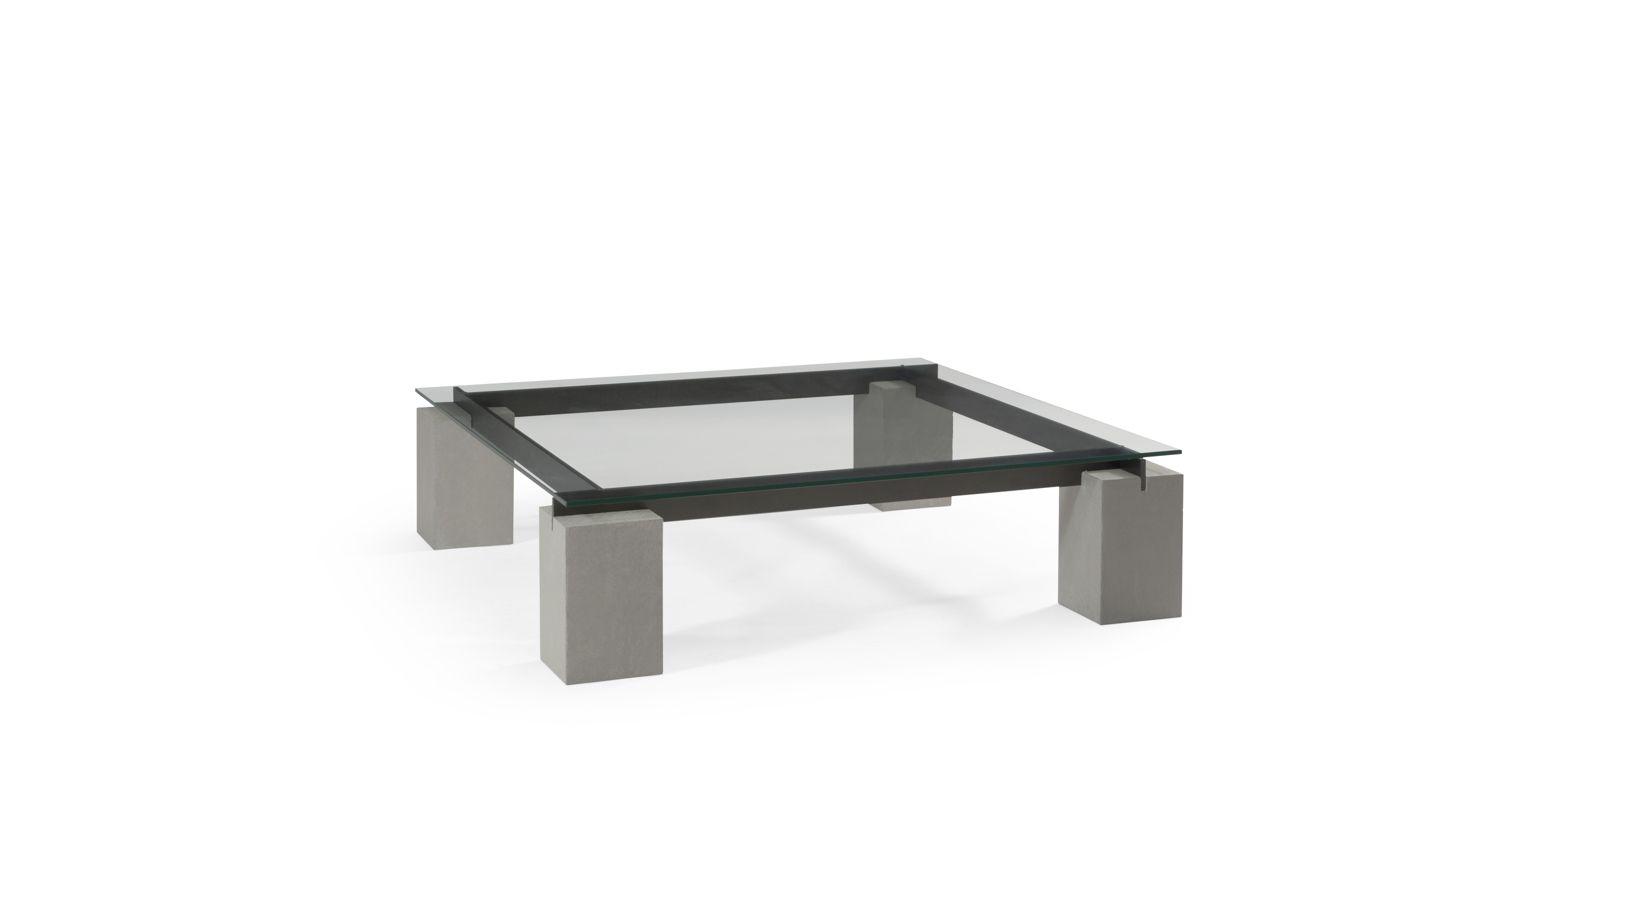 Table basse carr e t n r roche bobois - Roche bobois table basse ...